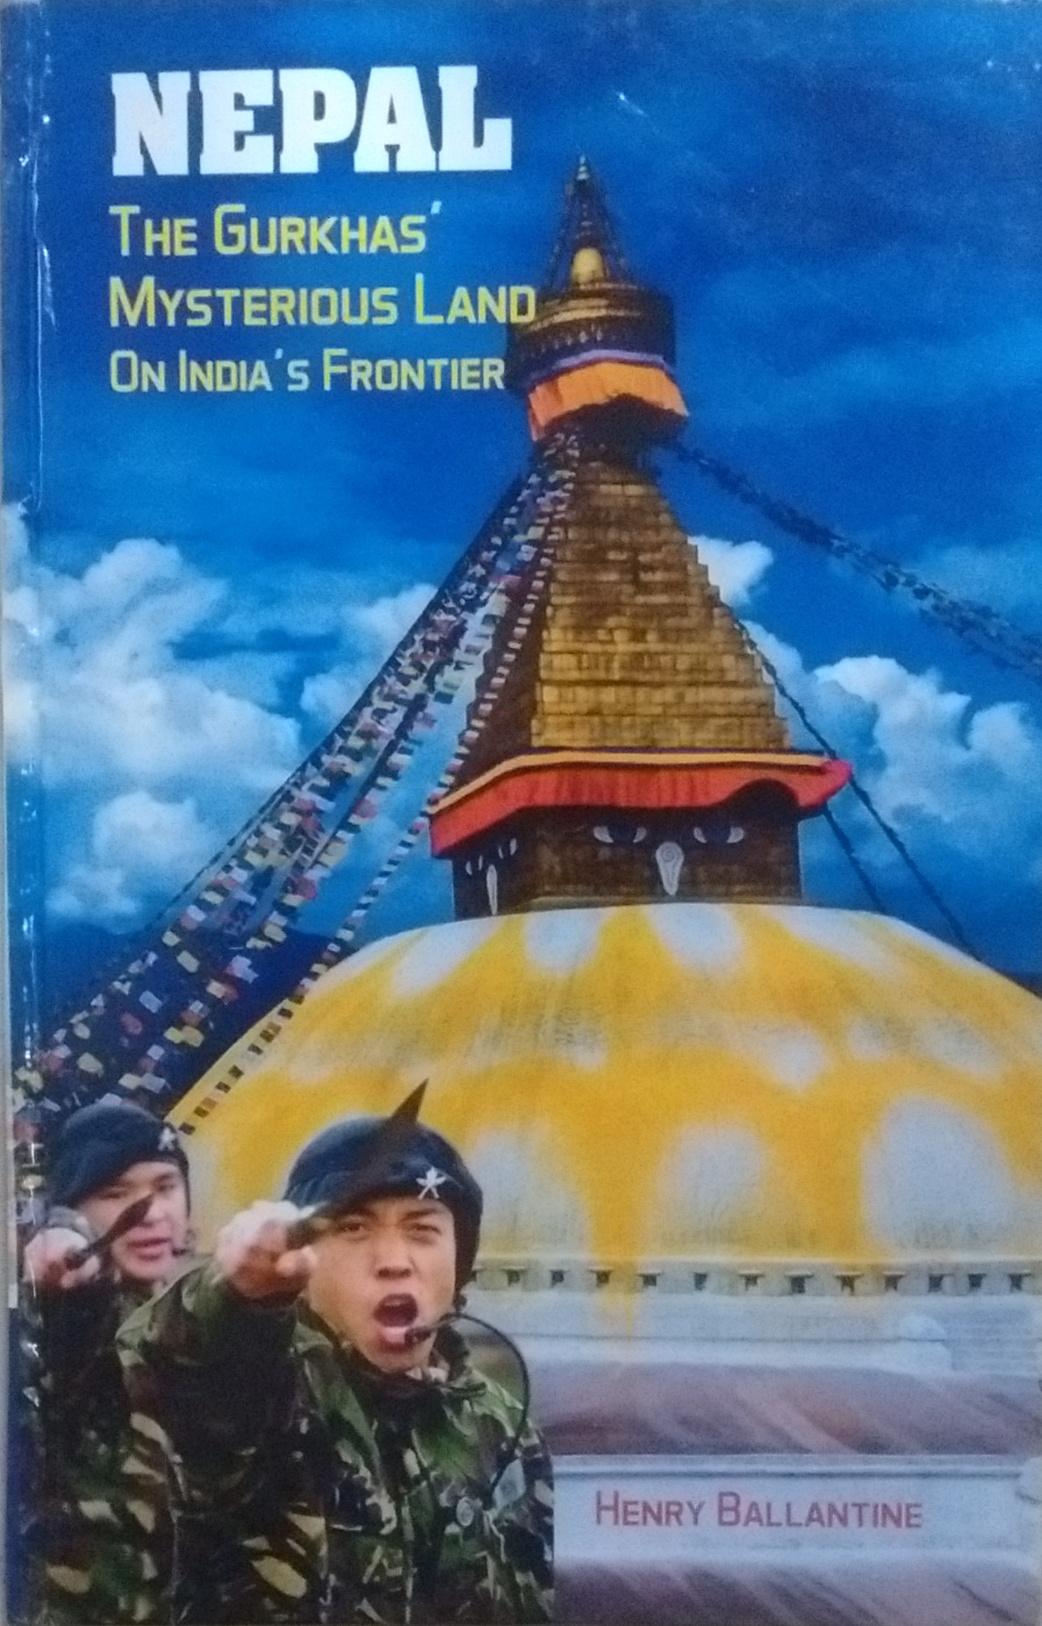 NEPAL The Gurkhas' Mysterious Land (On India's Fro…